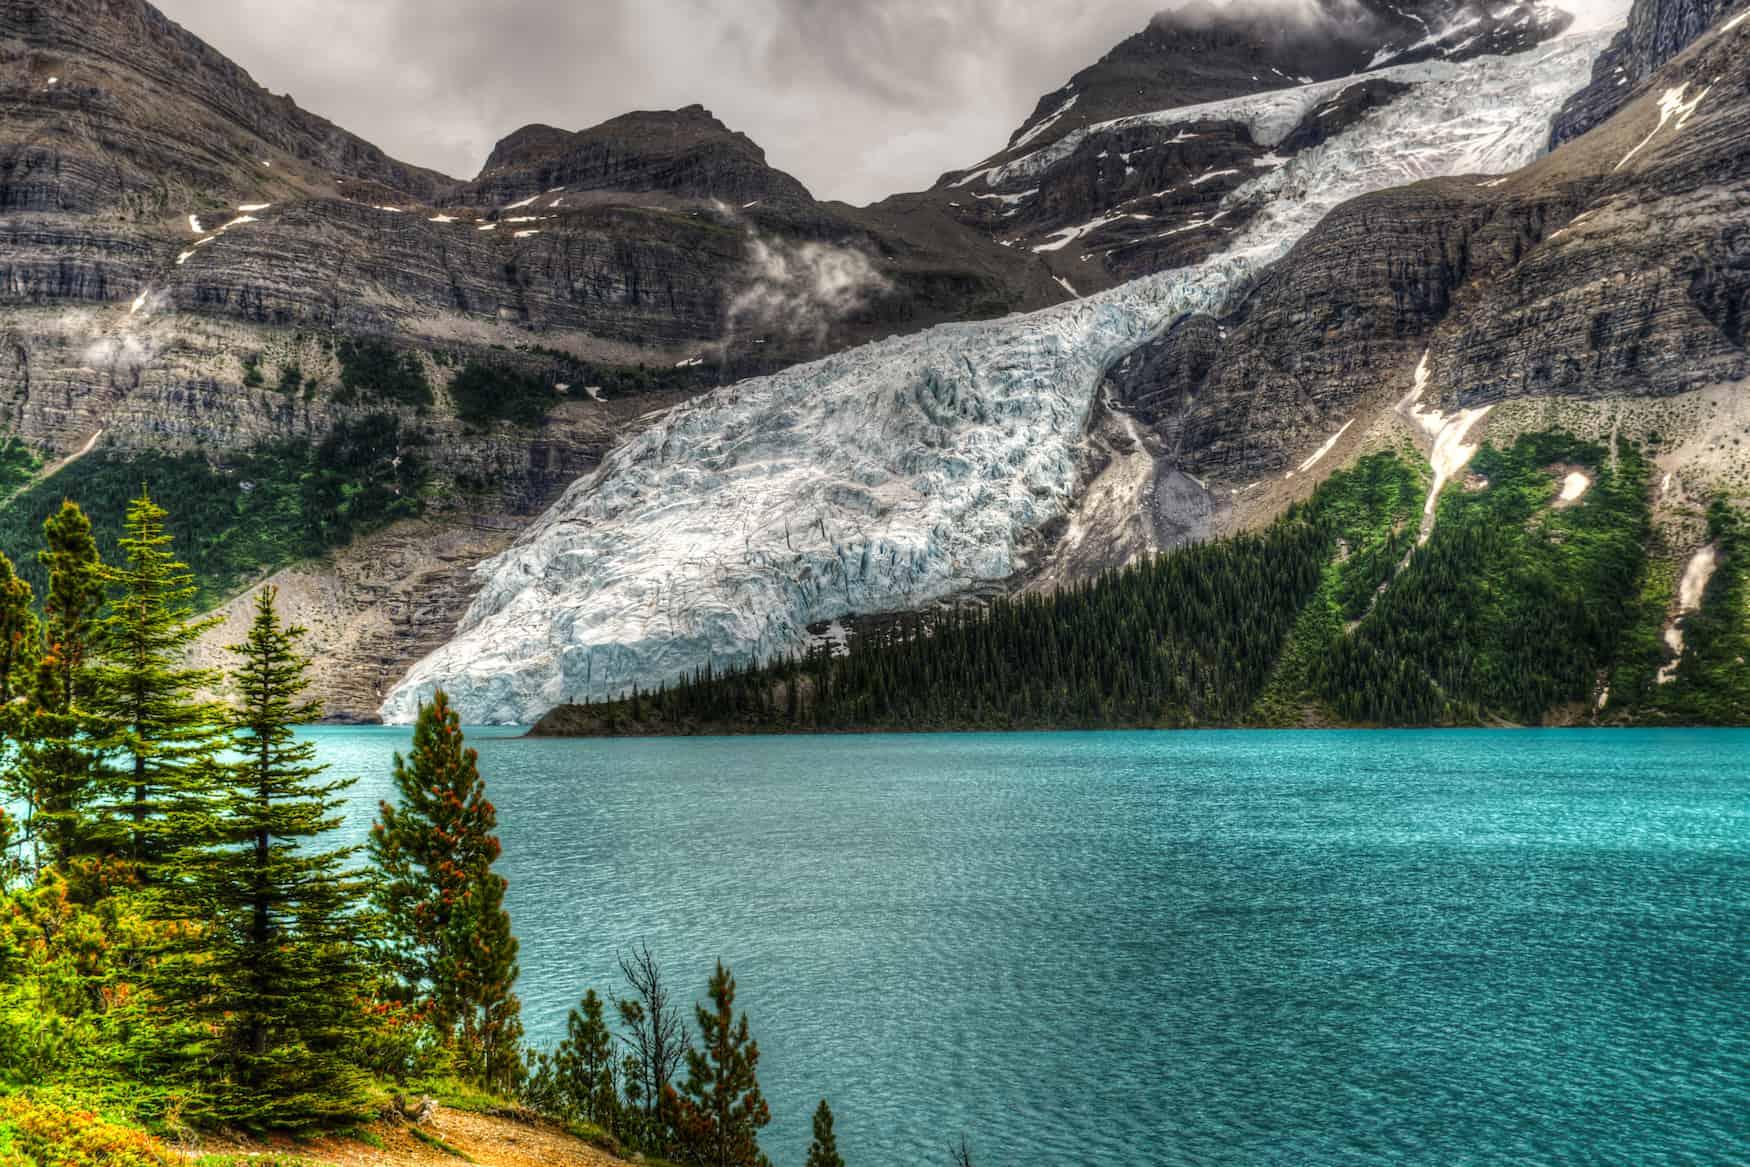 Berg Lake, Mount Robson Provincial Park, British Columbia